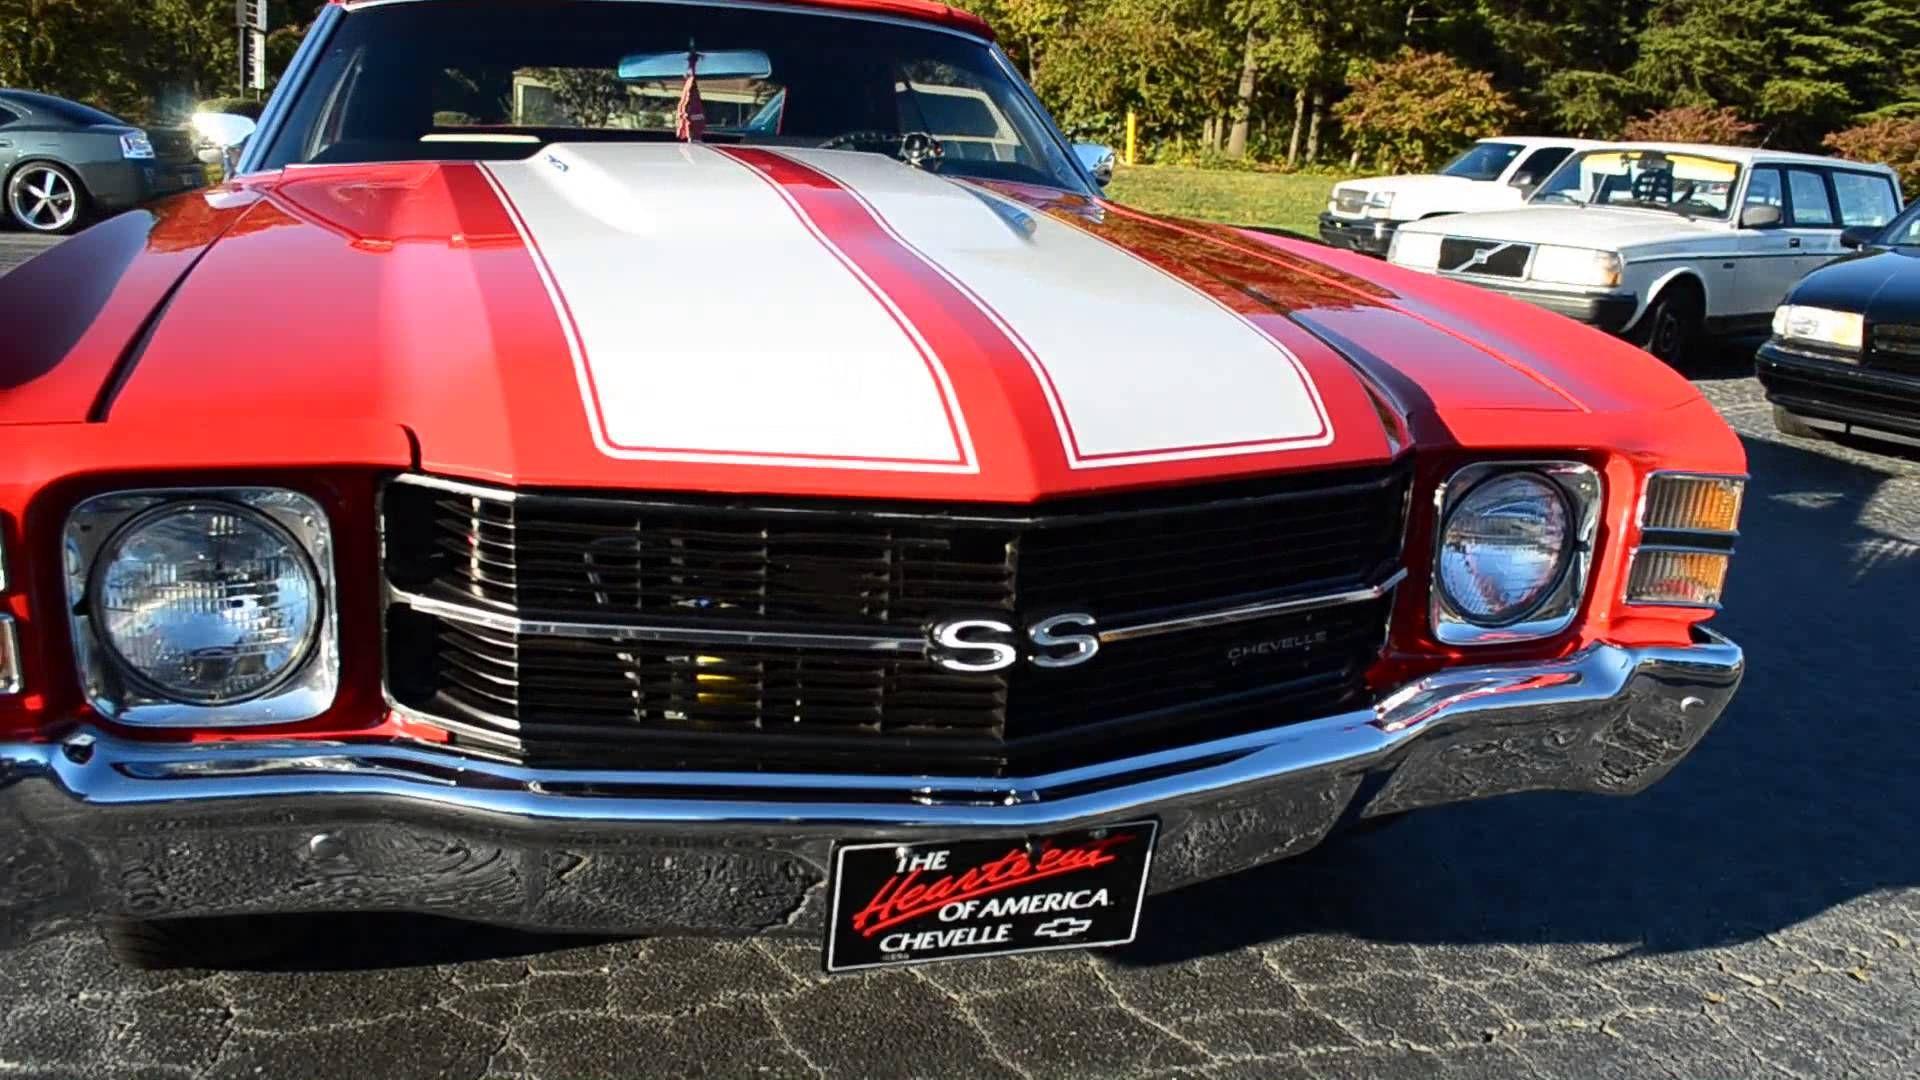 video - Old Skool Car Club\'s Red Chevelle. 71 asanti wheels 22 ...